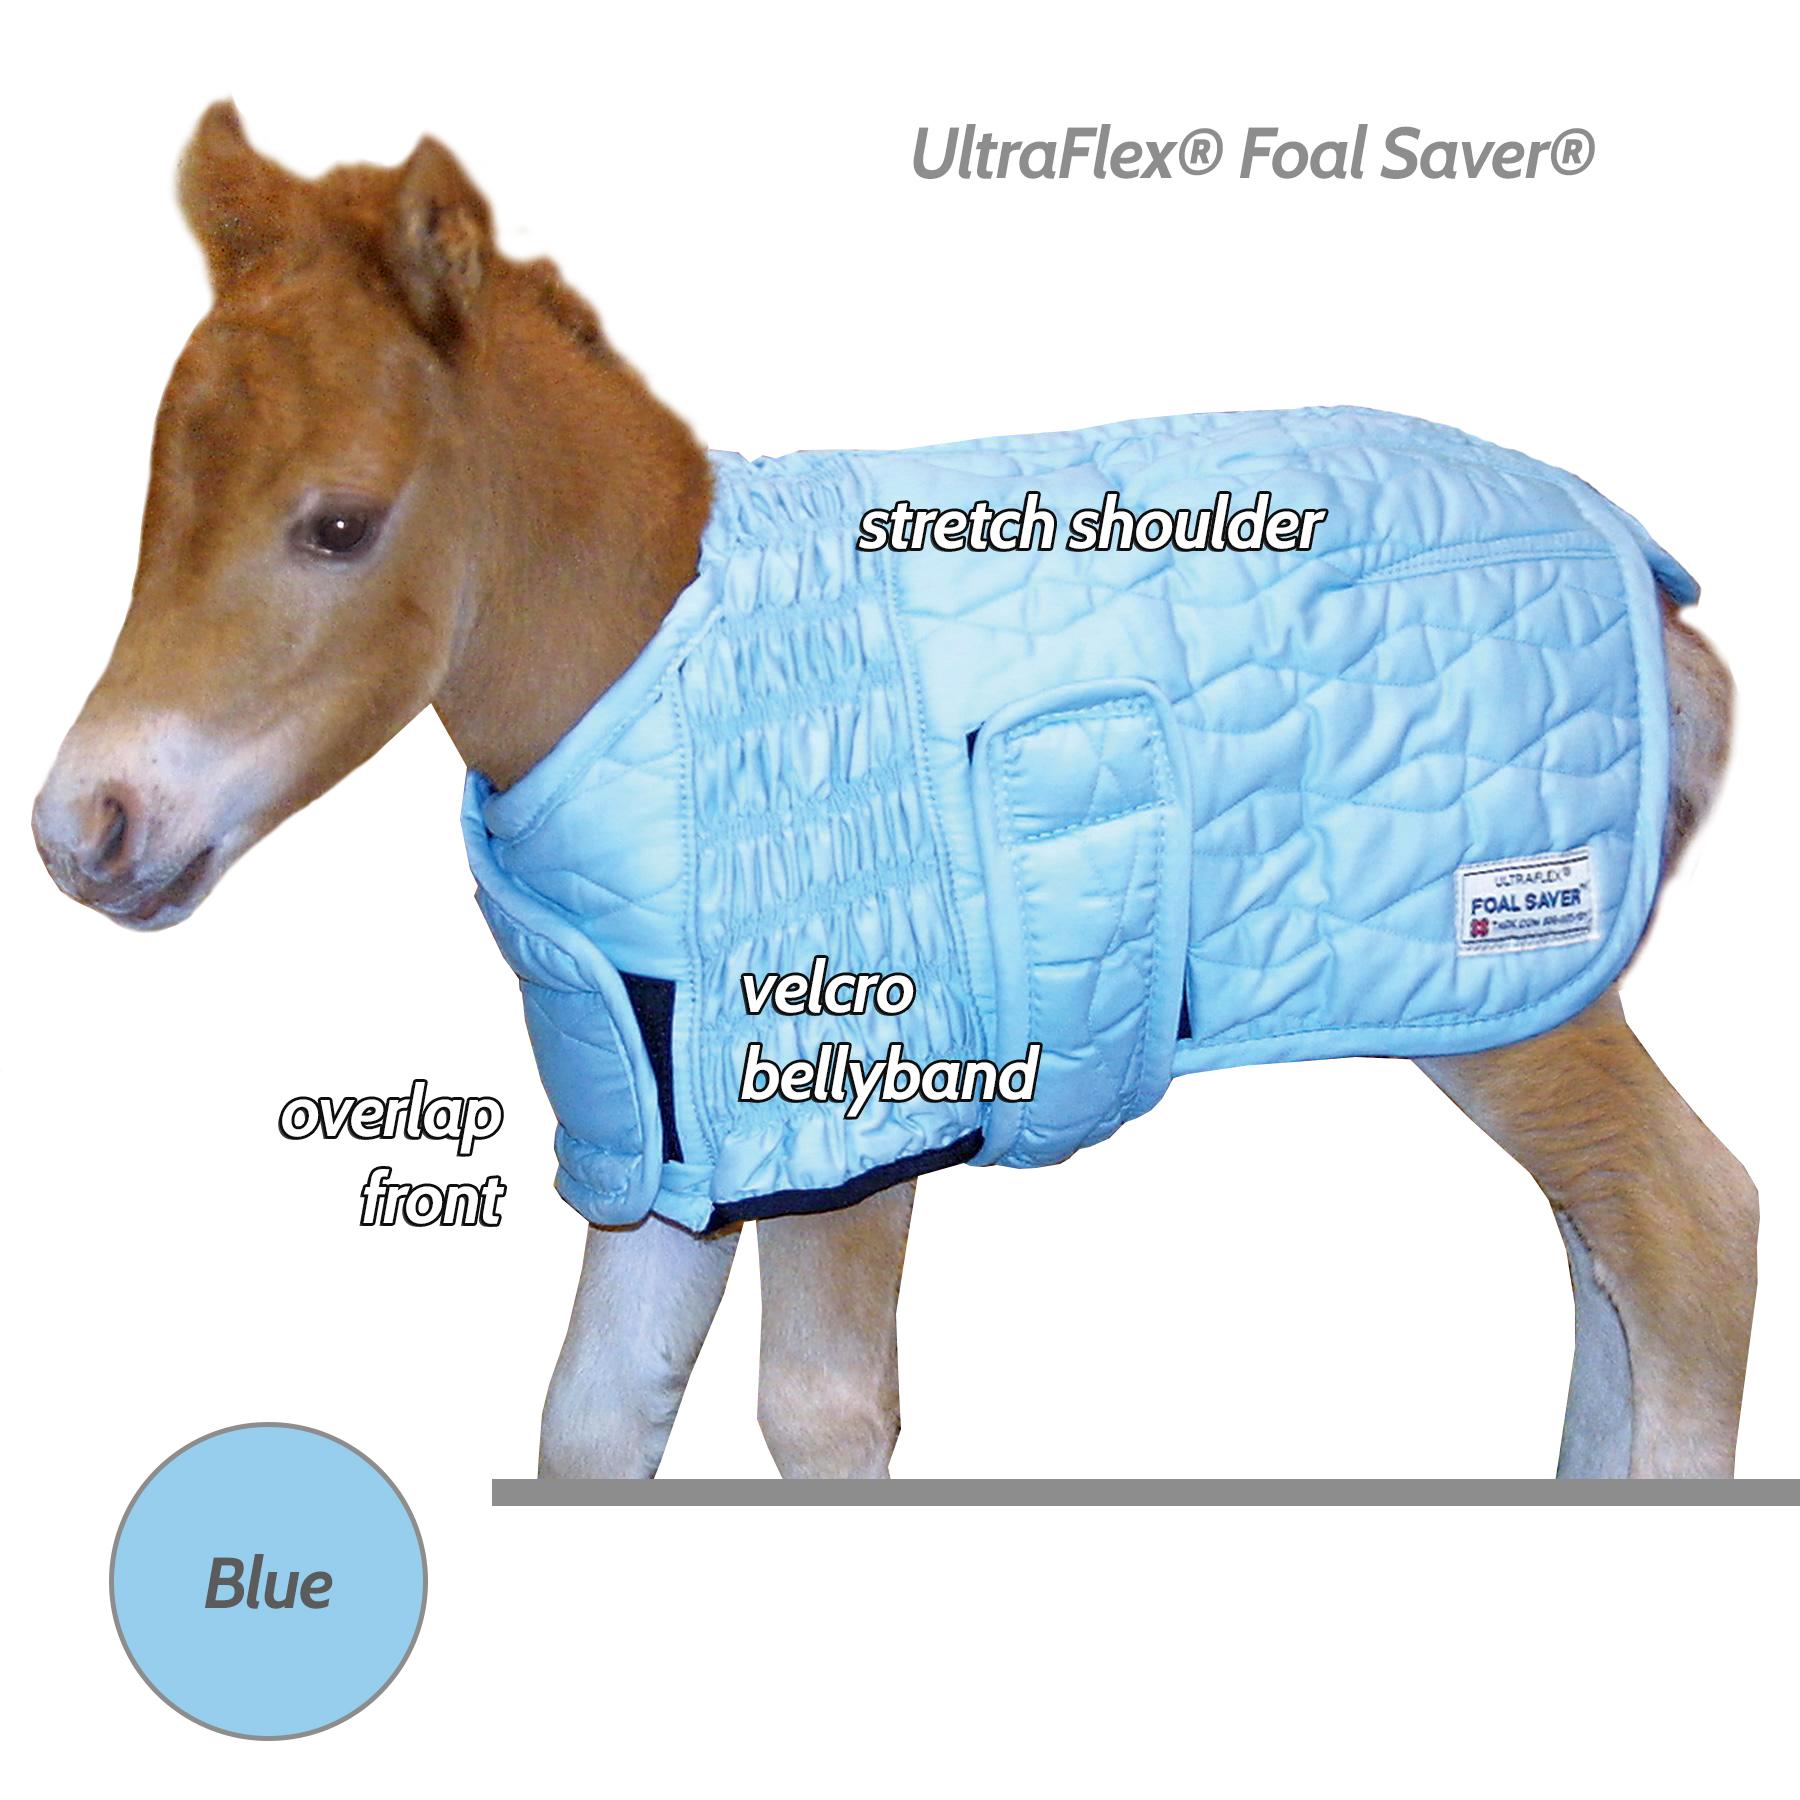 ai07729-UltraFlex®-Foal-Saver®